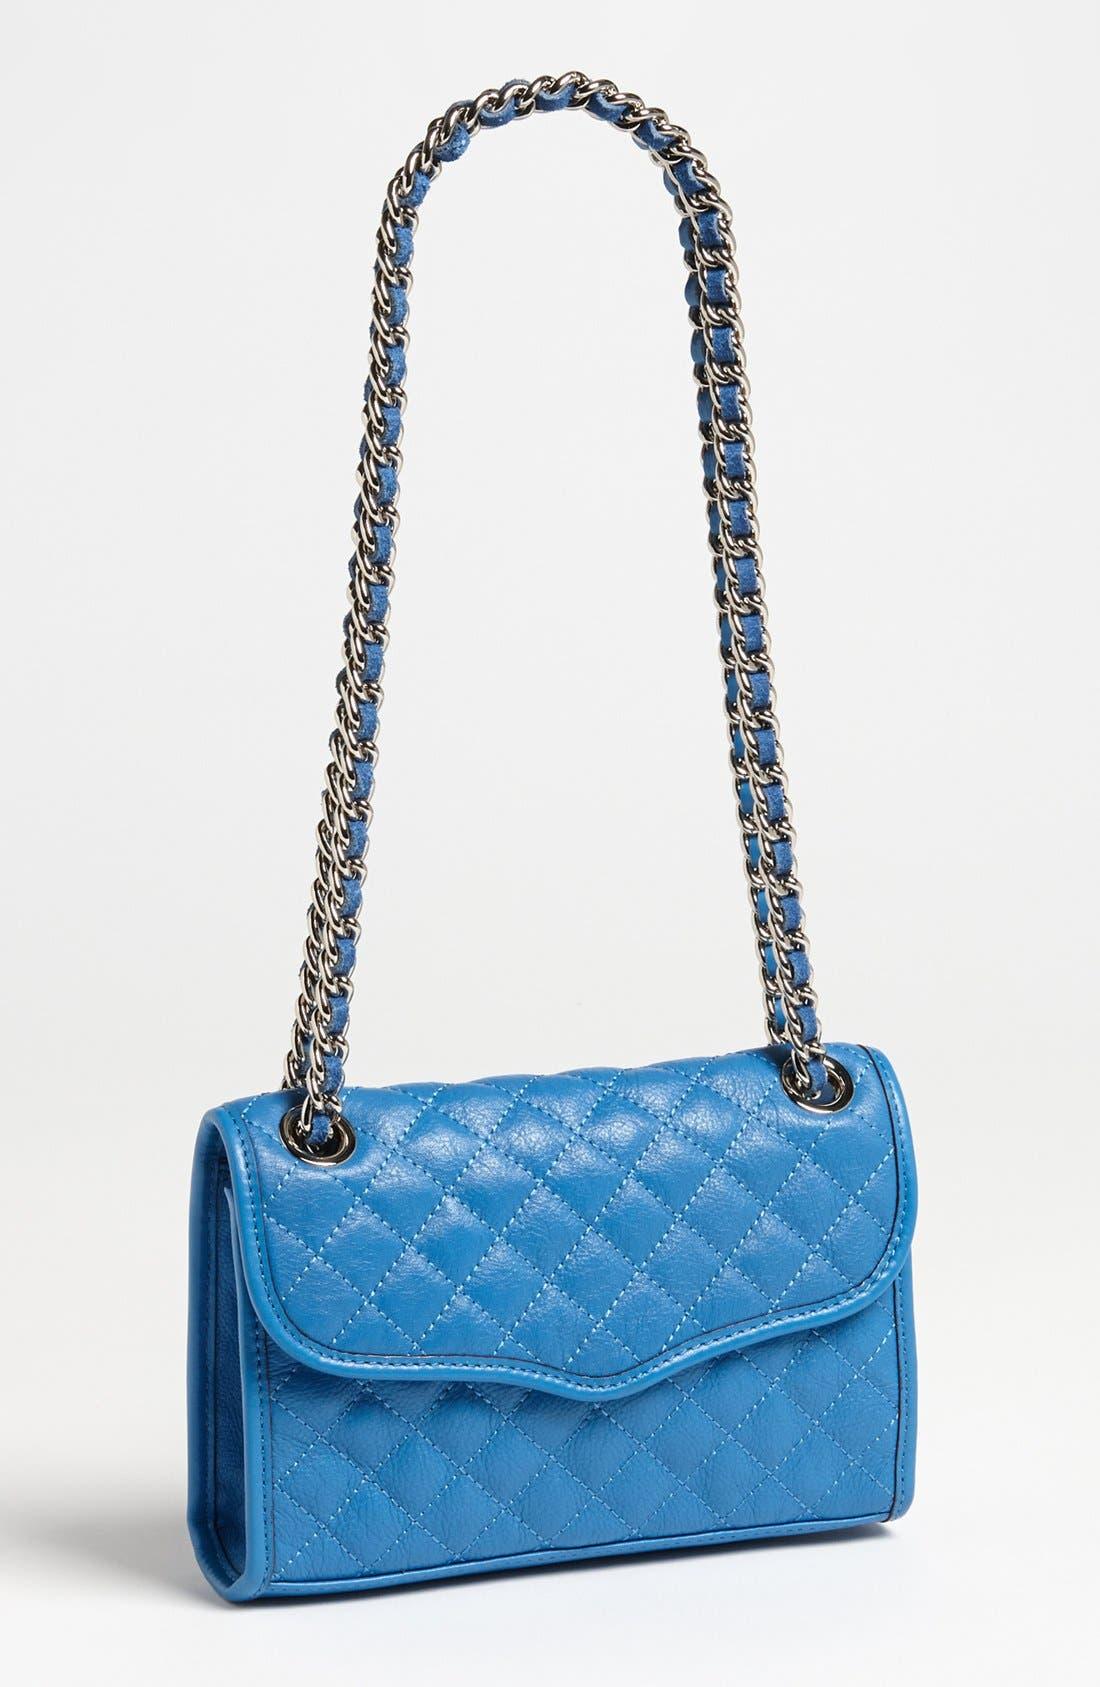 Main Image - Rebecca Minkoff 'Quilted Mini Affair' Convertible Crossbody Bag